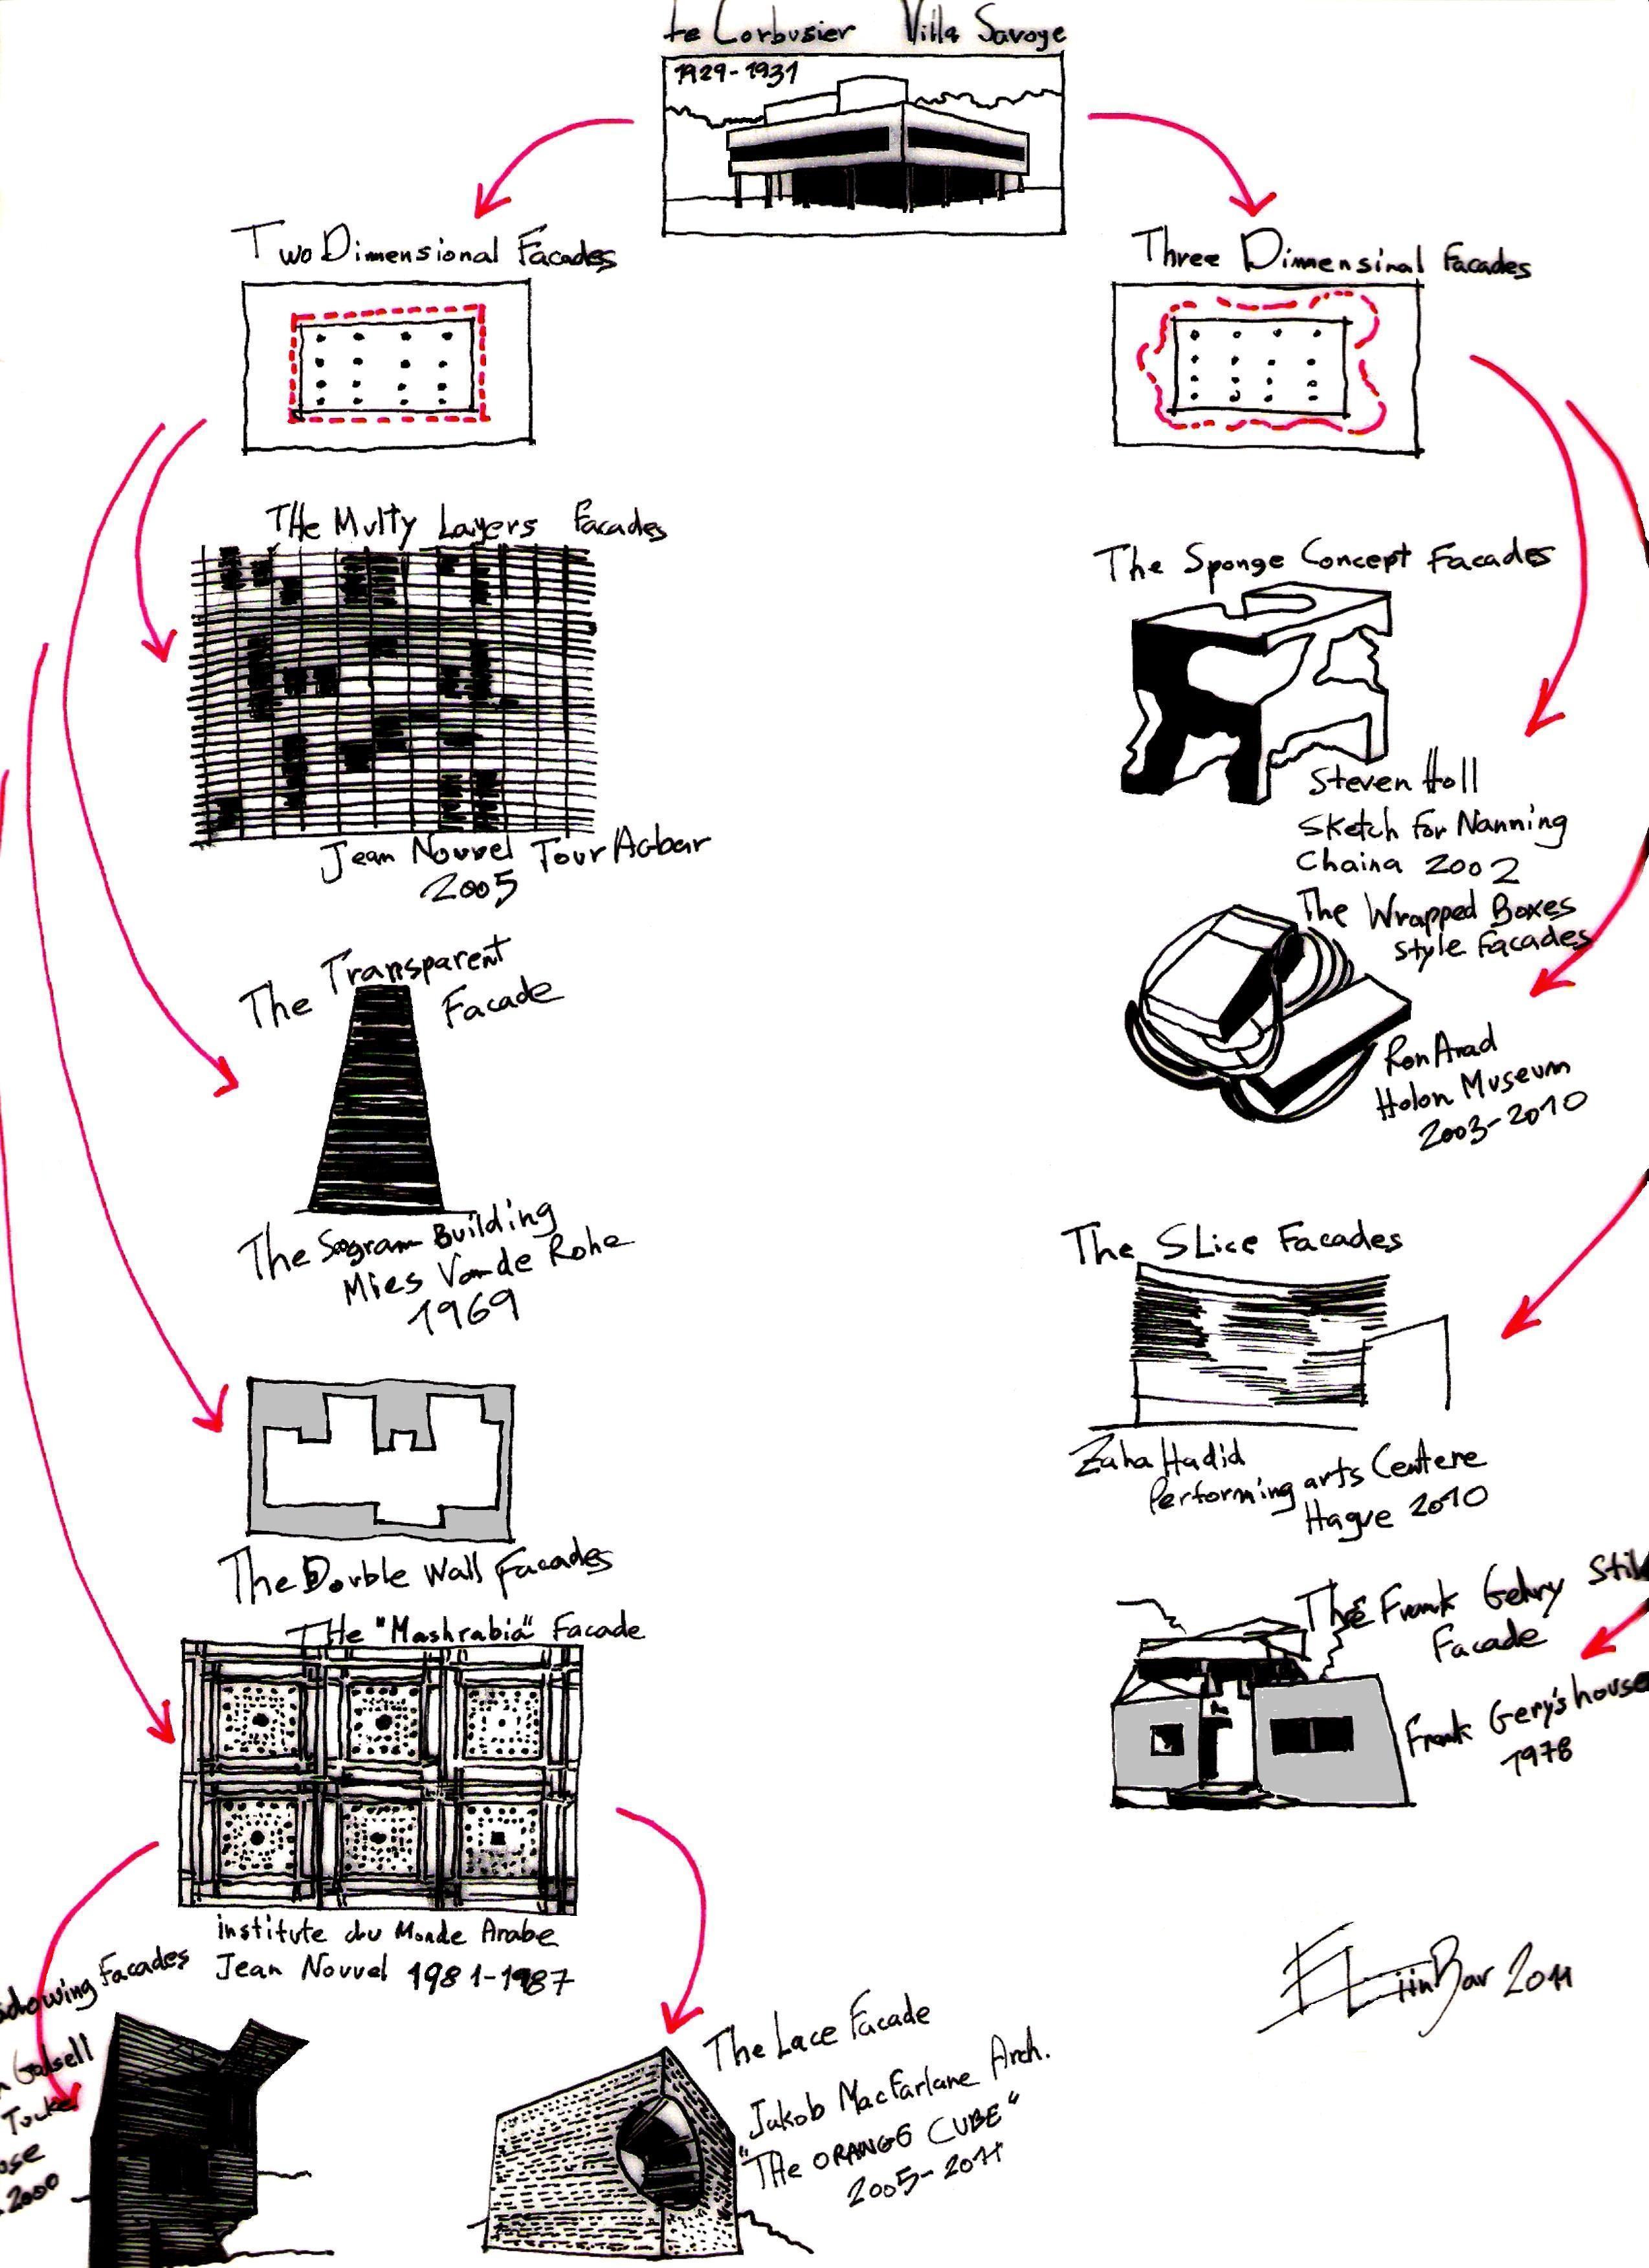 Le Corbusier Les 5 Points five points of architecture | someone has built it before